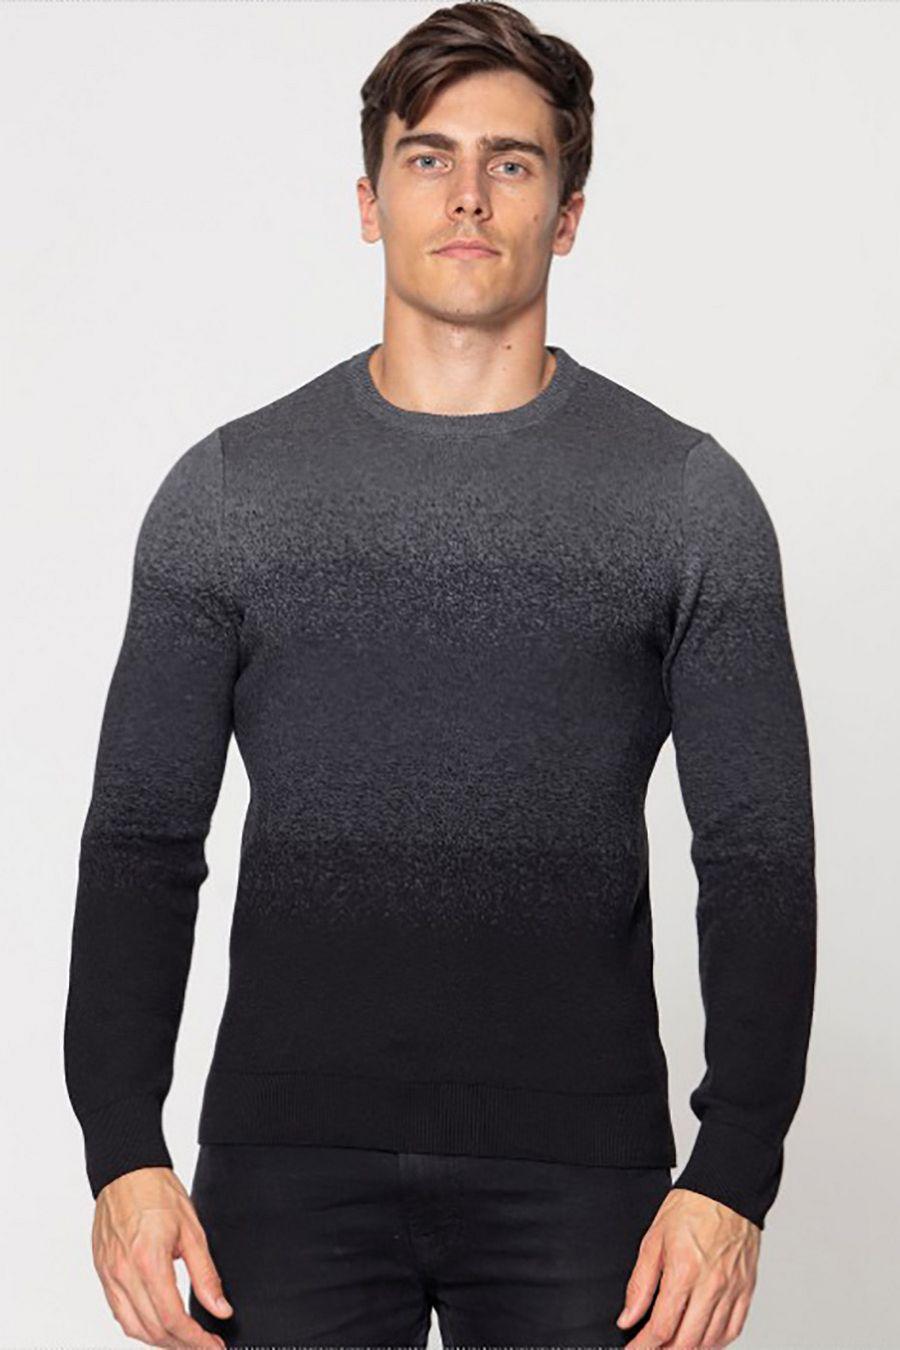 Джемпер (свитер) мужской Pooll Park 201405 Black - фото 1